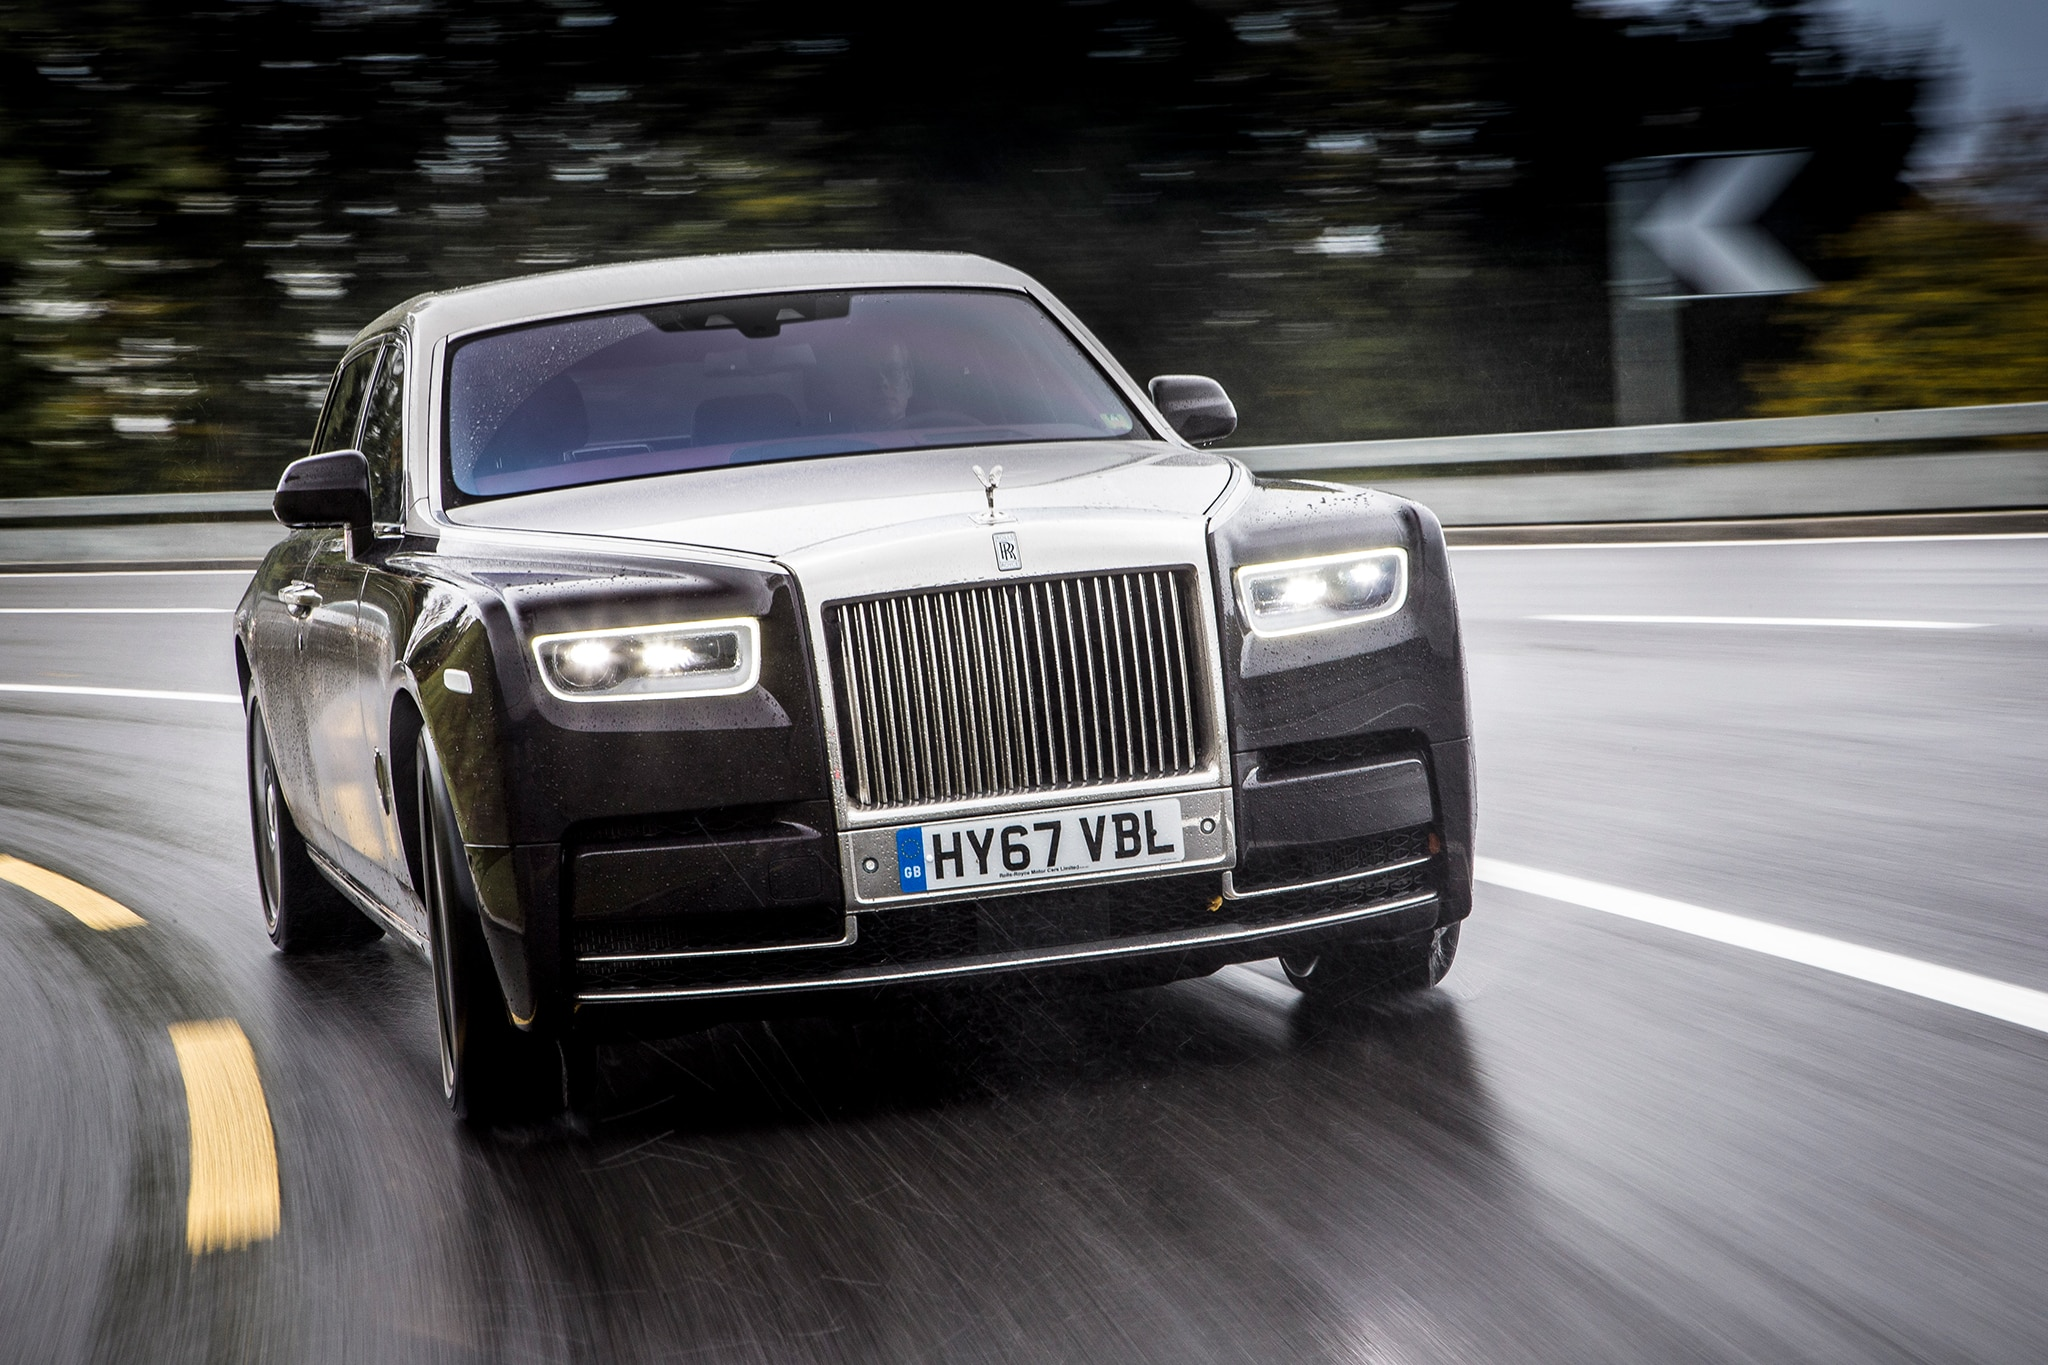 2018 Rolls Royce Phantom VIII Front View In Motion 11